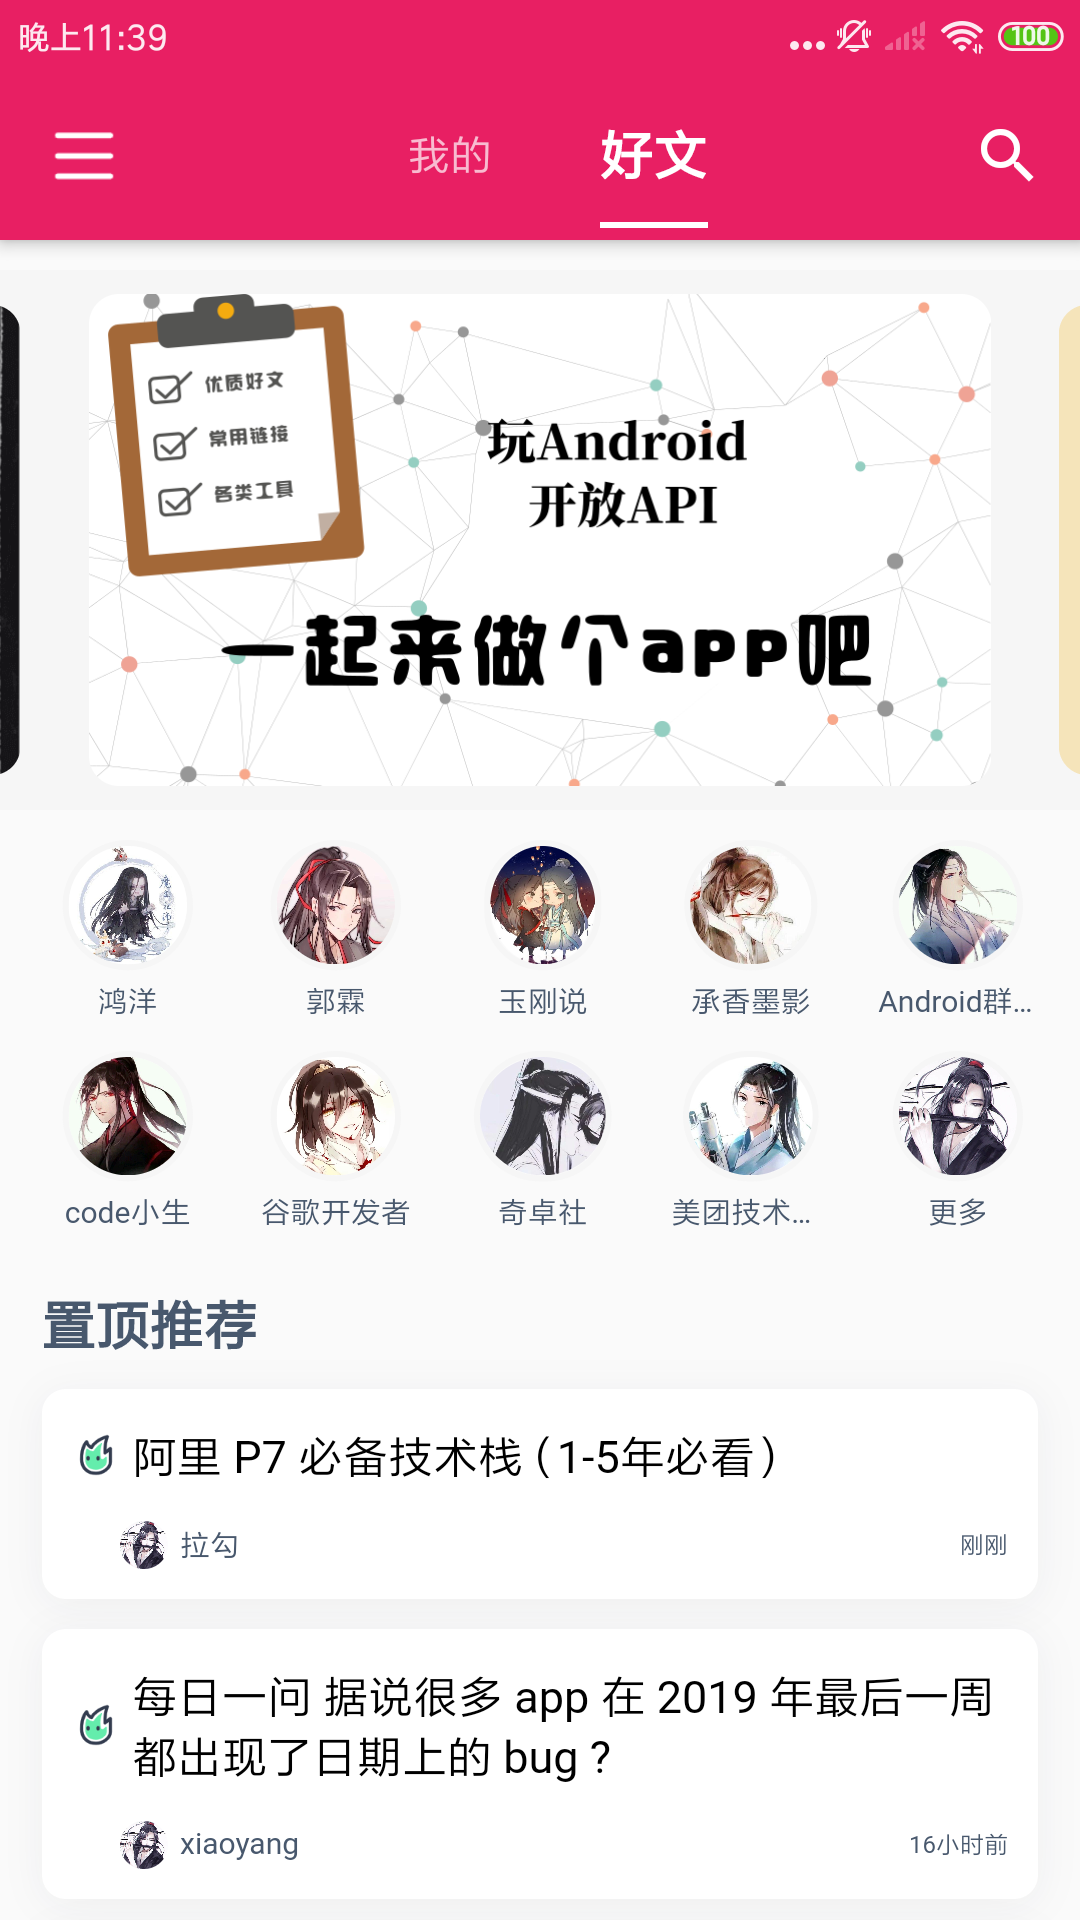 Screenshot_2020-01-07-23-39-11-008_com.lht.flutter_android_fun.png